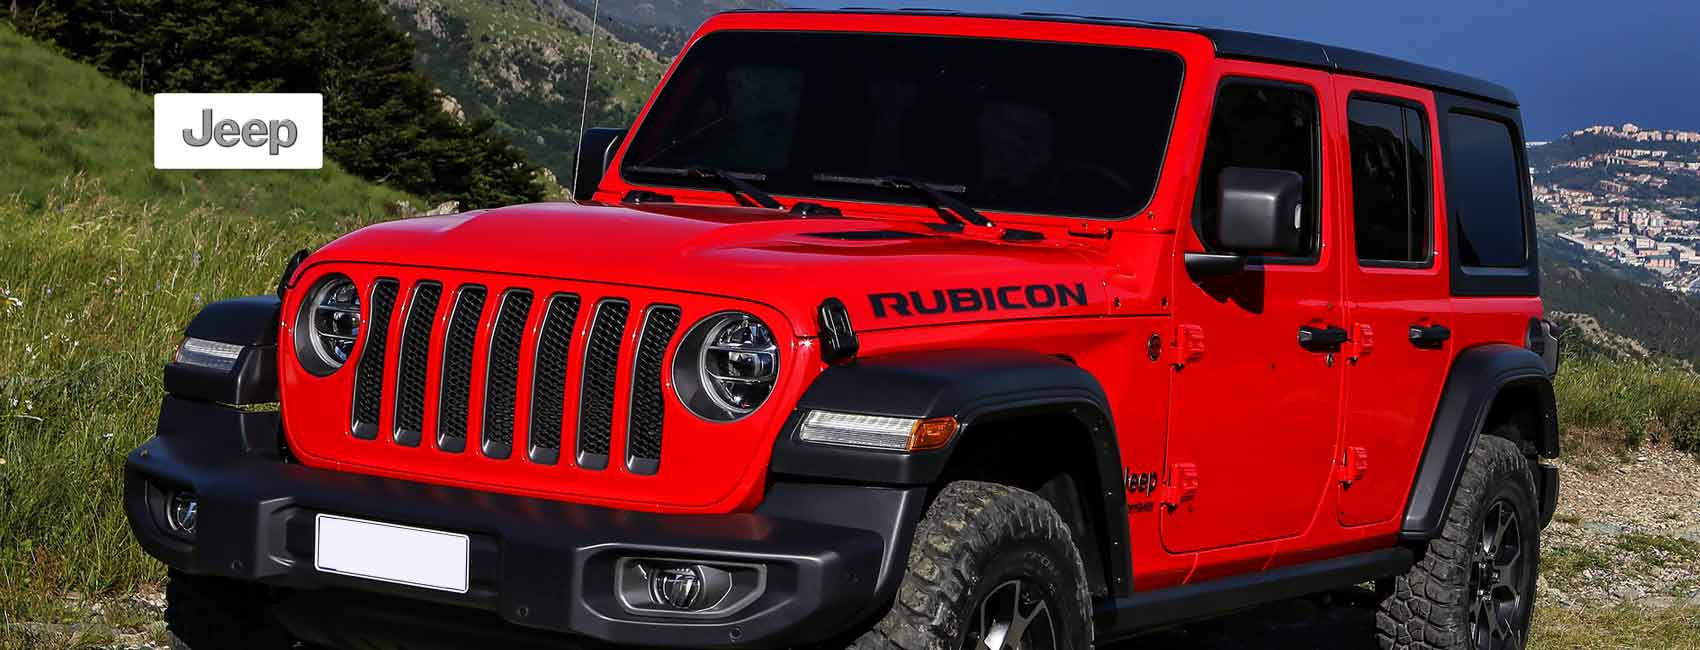 Used Jeep Wrangler Parts >> Jeep Wrangler Parts Buy Used Jeep Wrangler Parts Online